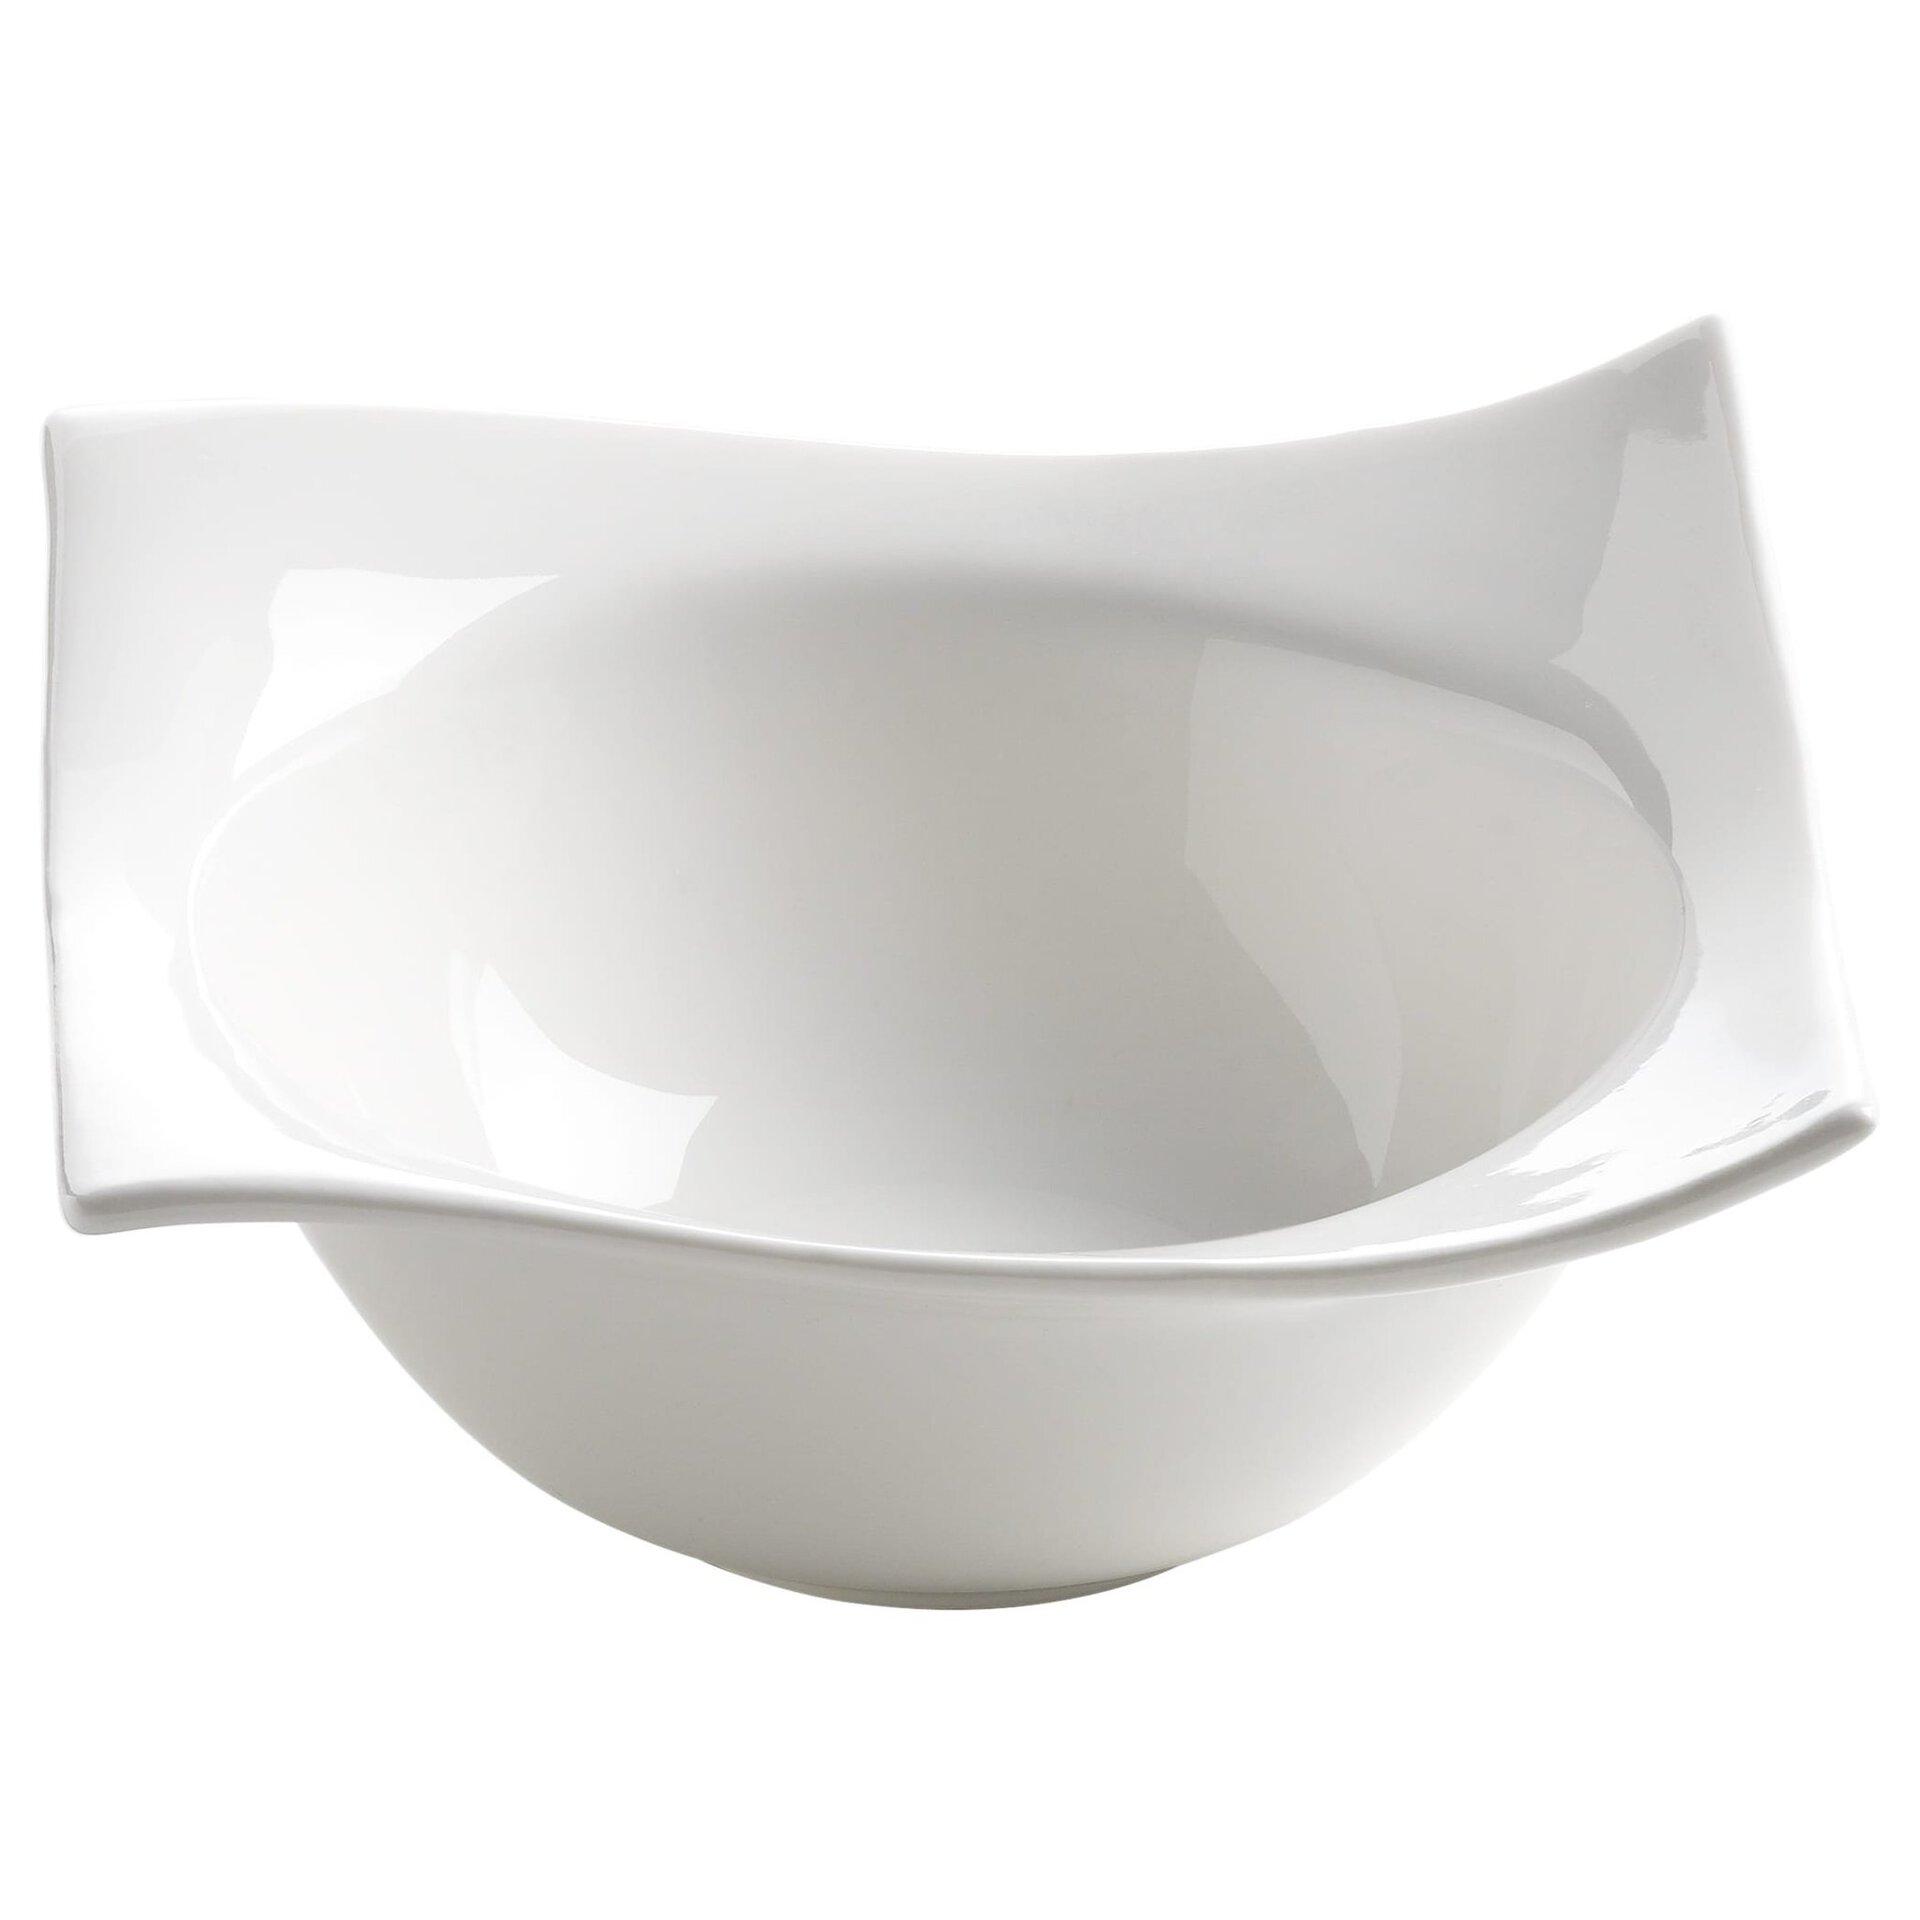 Schale Motion Maxwell & Williams Keramik